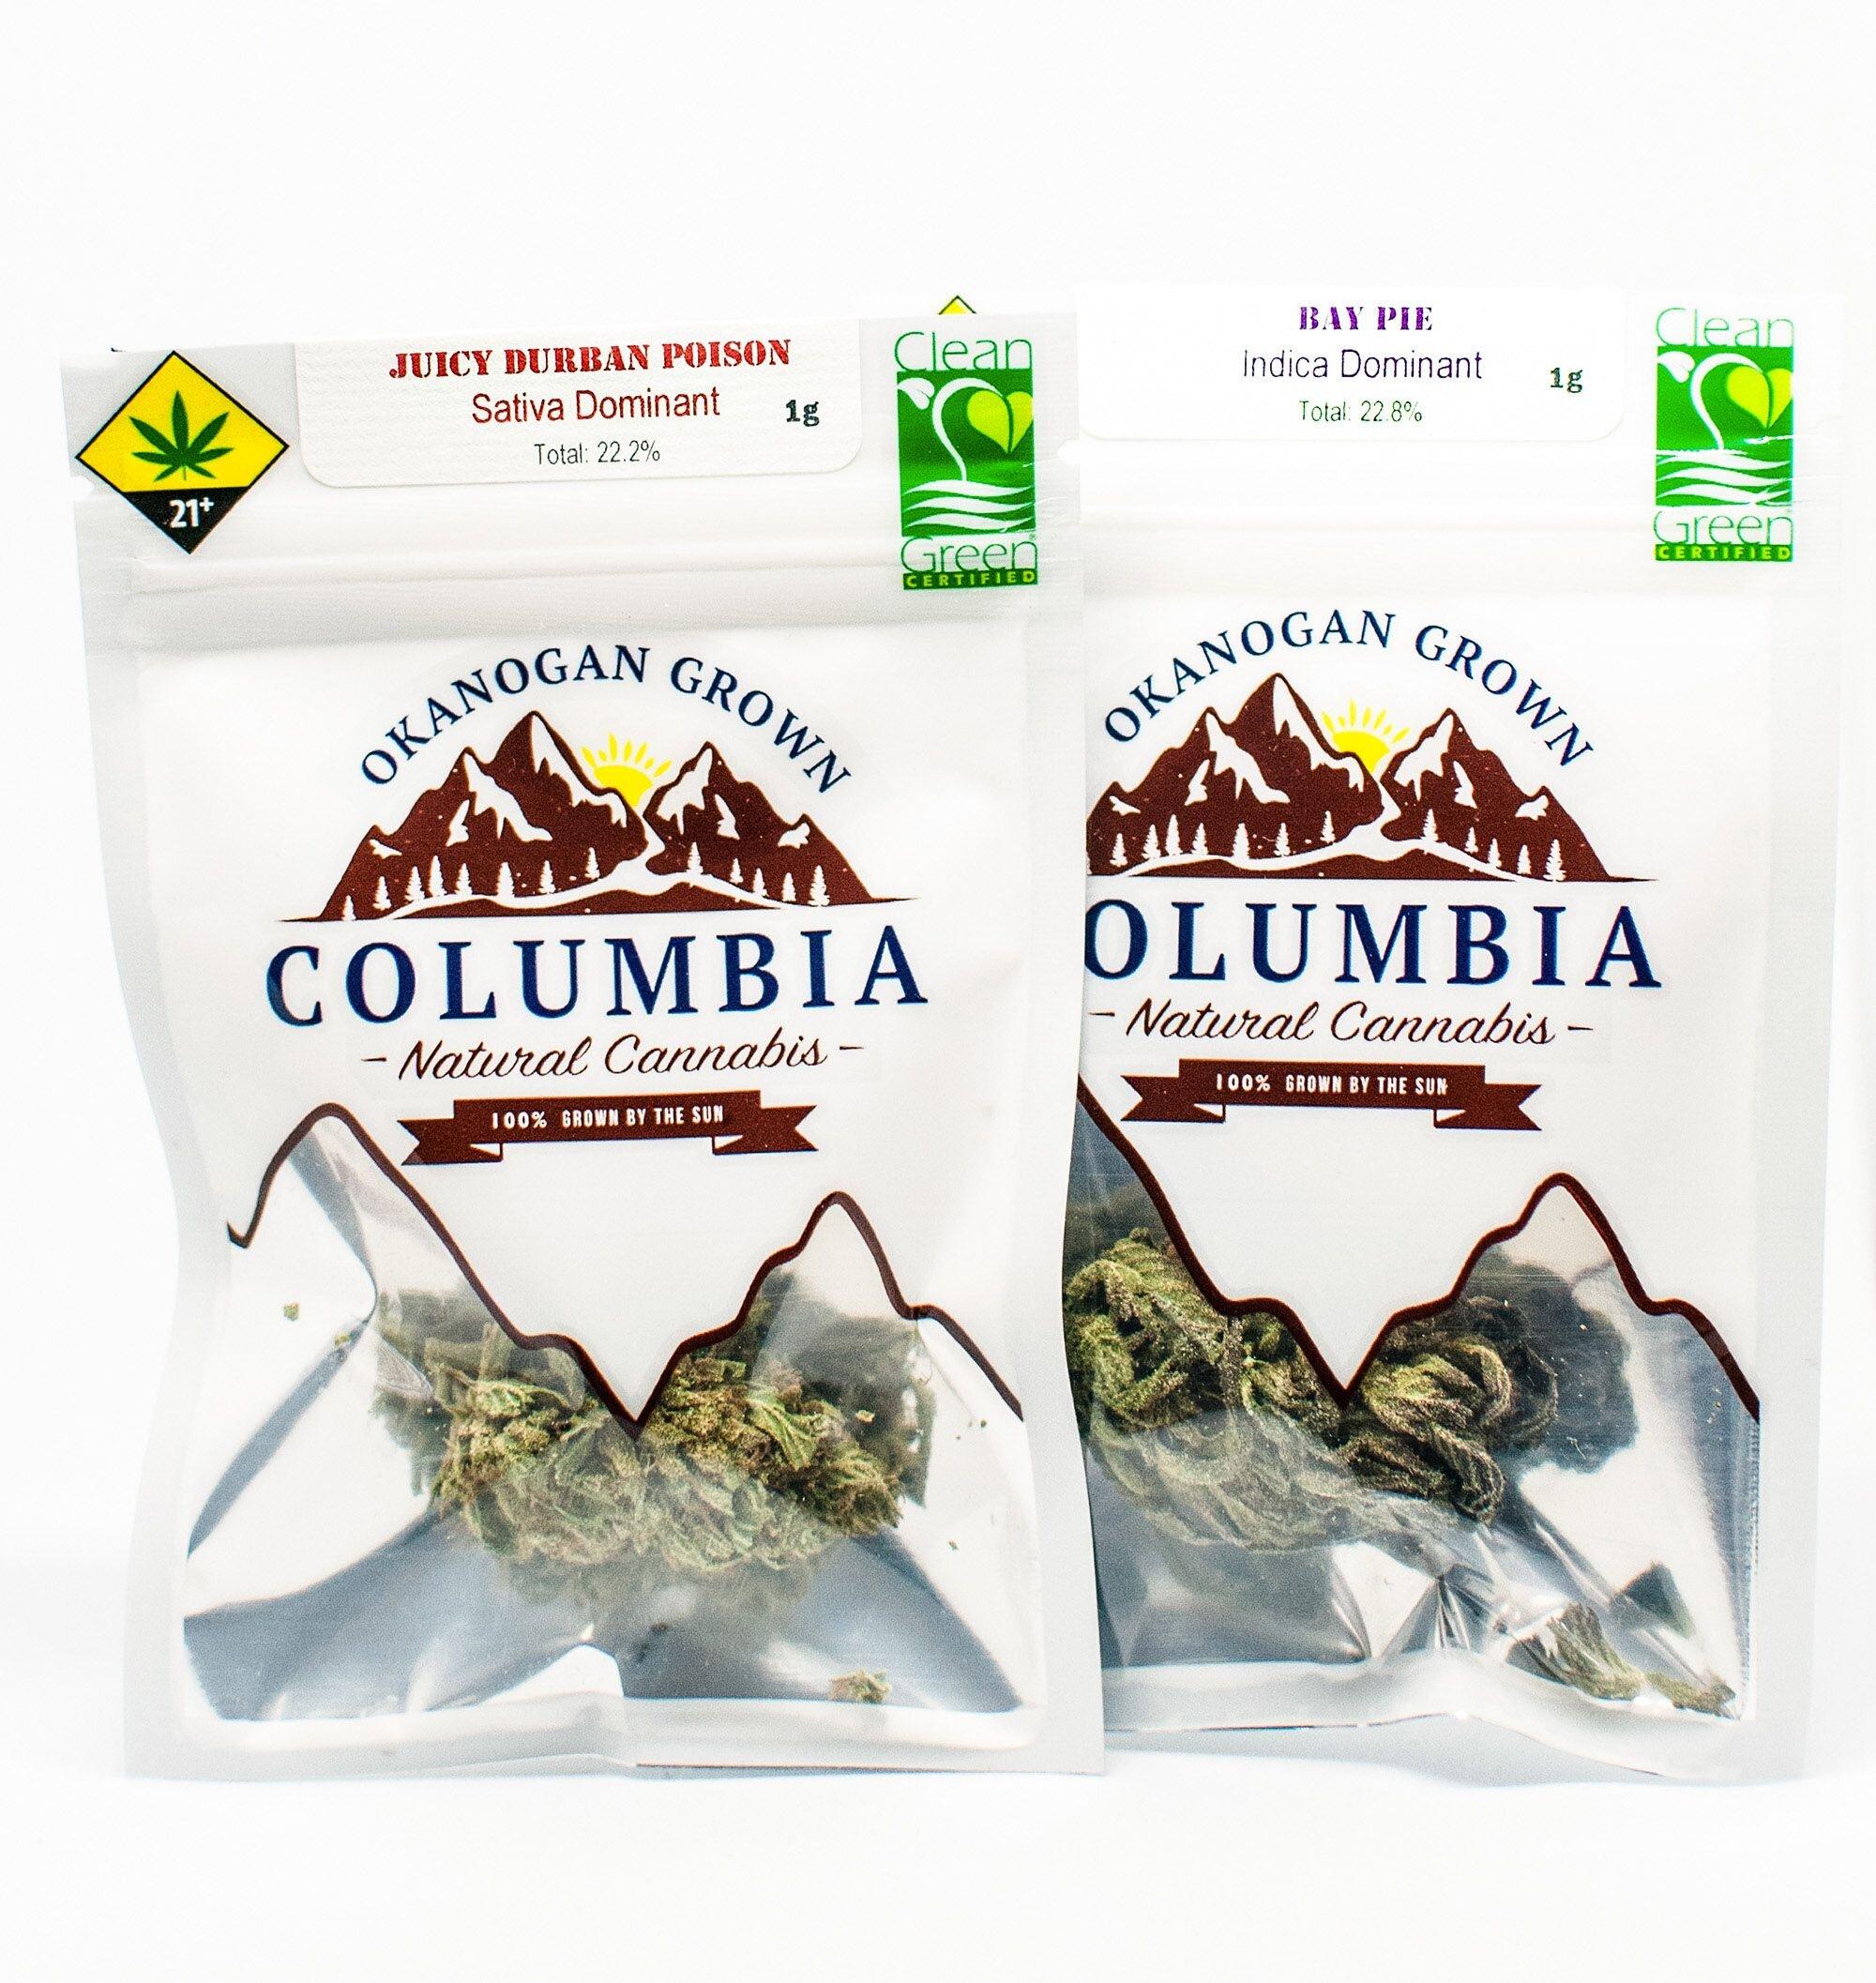 CannaSol-Columbia-Natural-Cannabis-de81e31b.jpeg